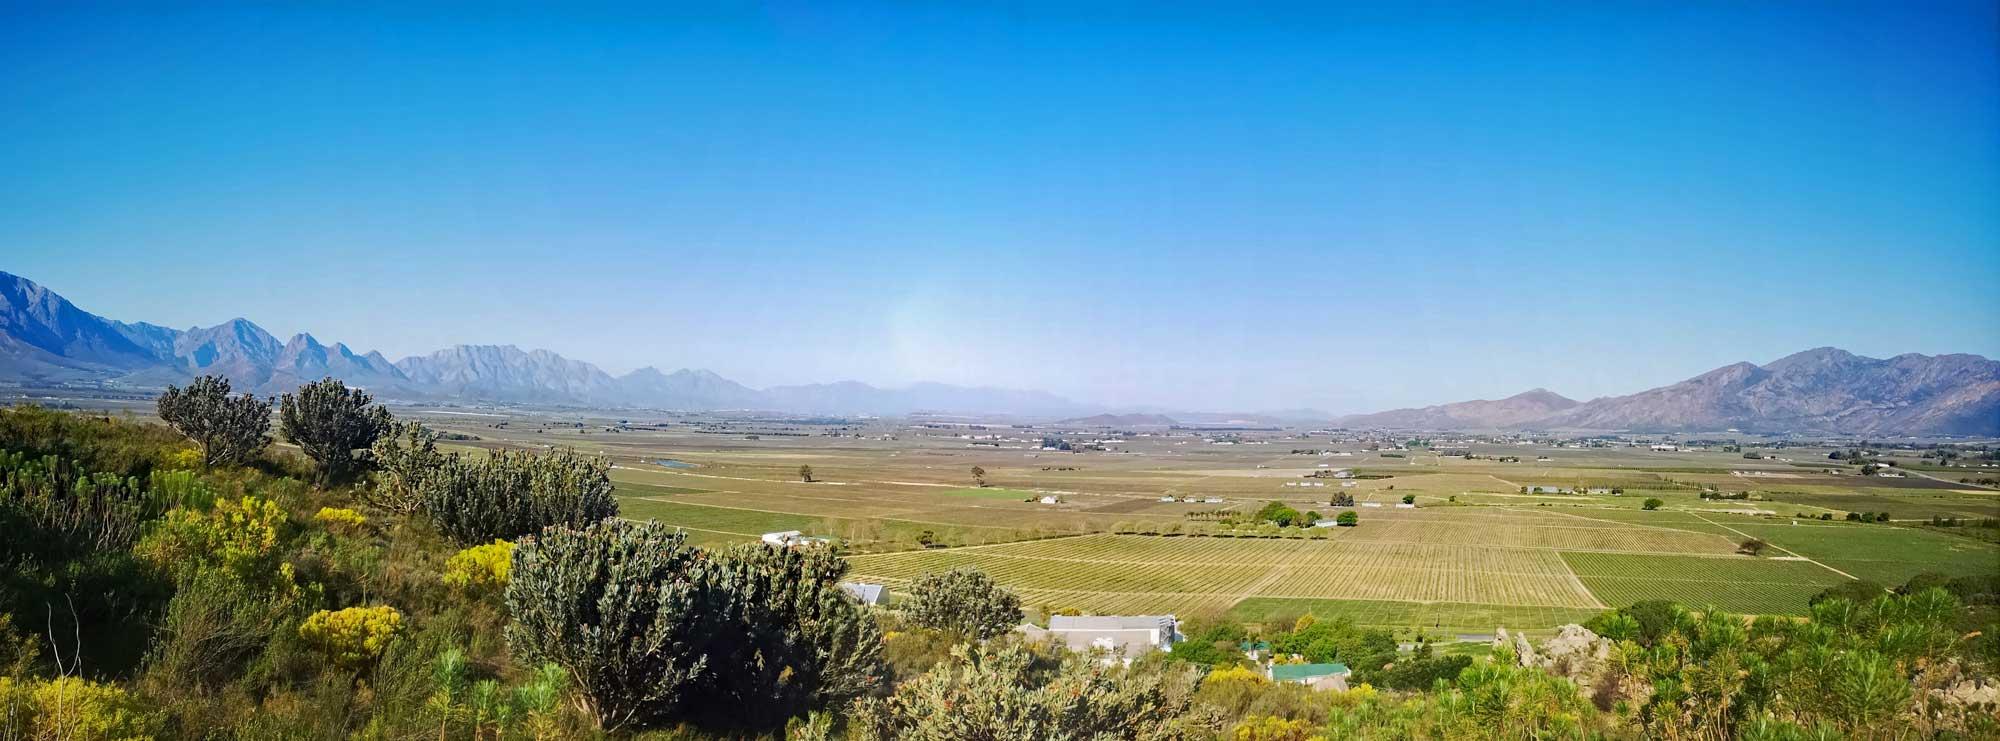 Badsberg Wine Cellar | Rawsonville, Western Cape, South Africa